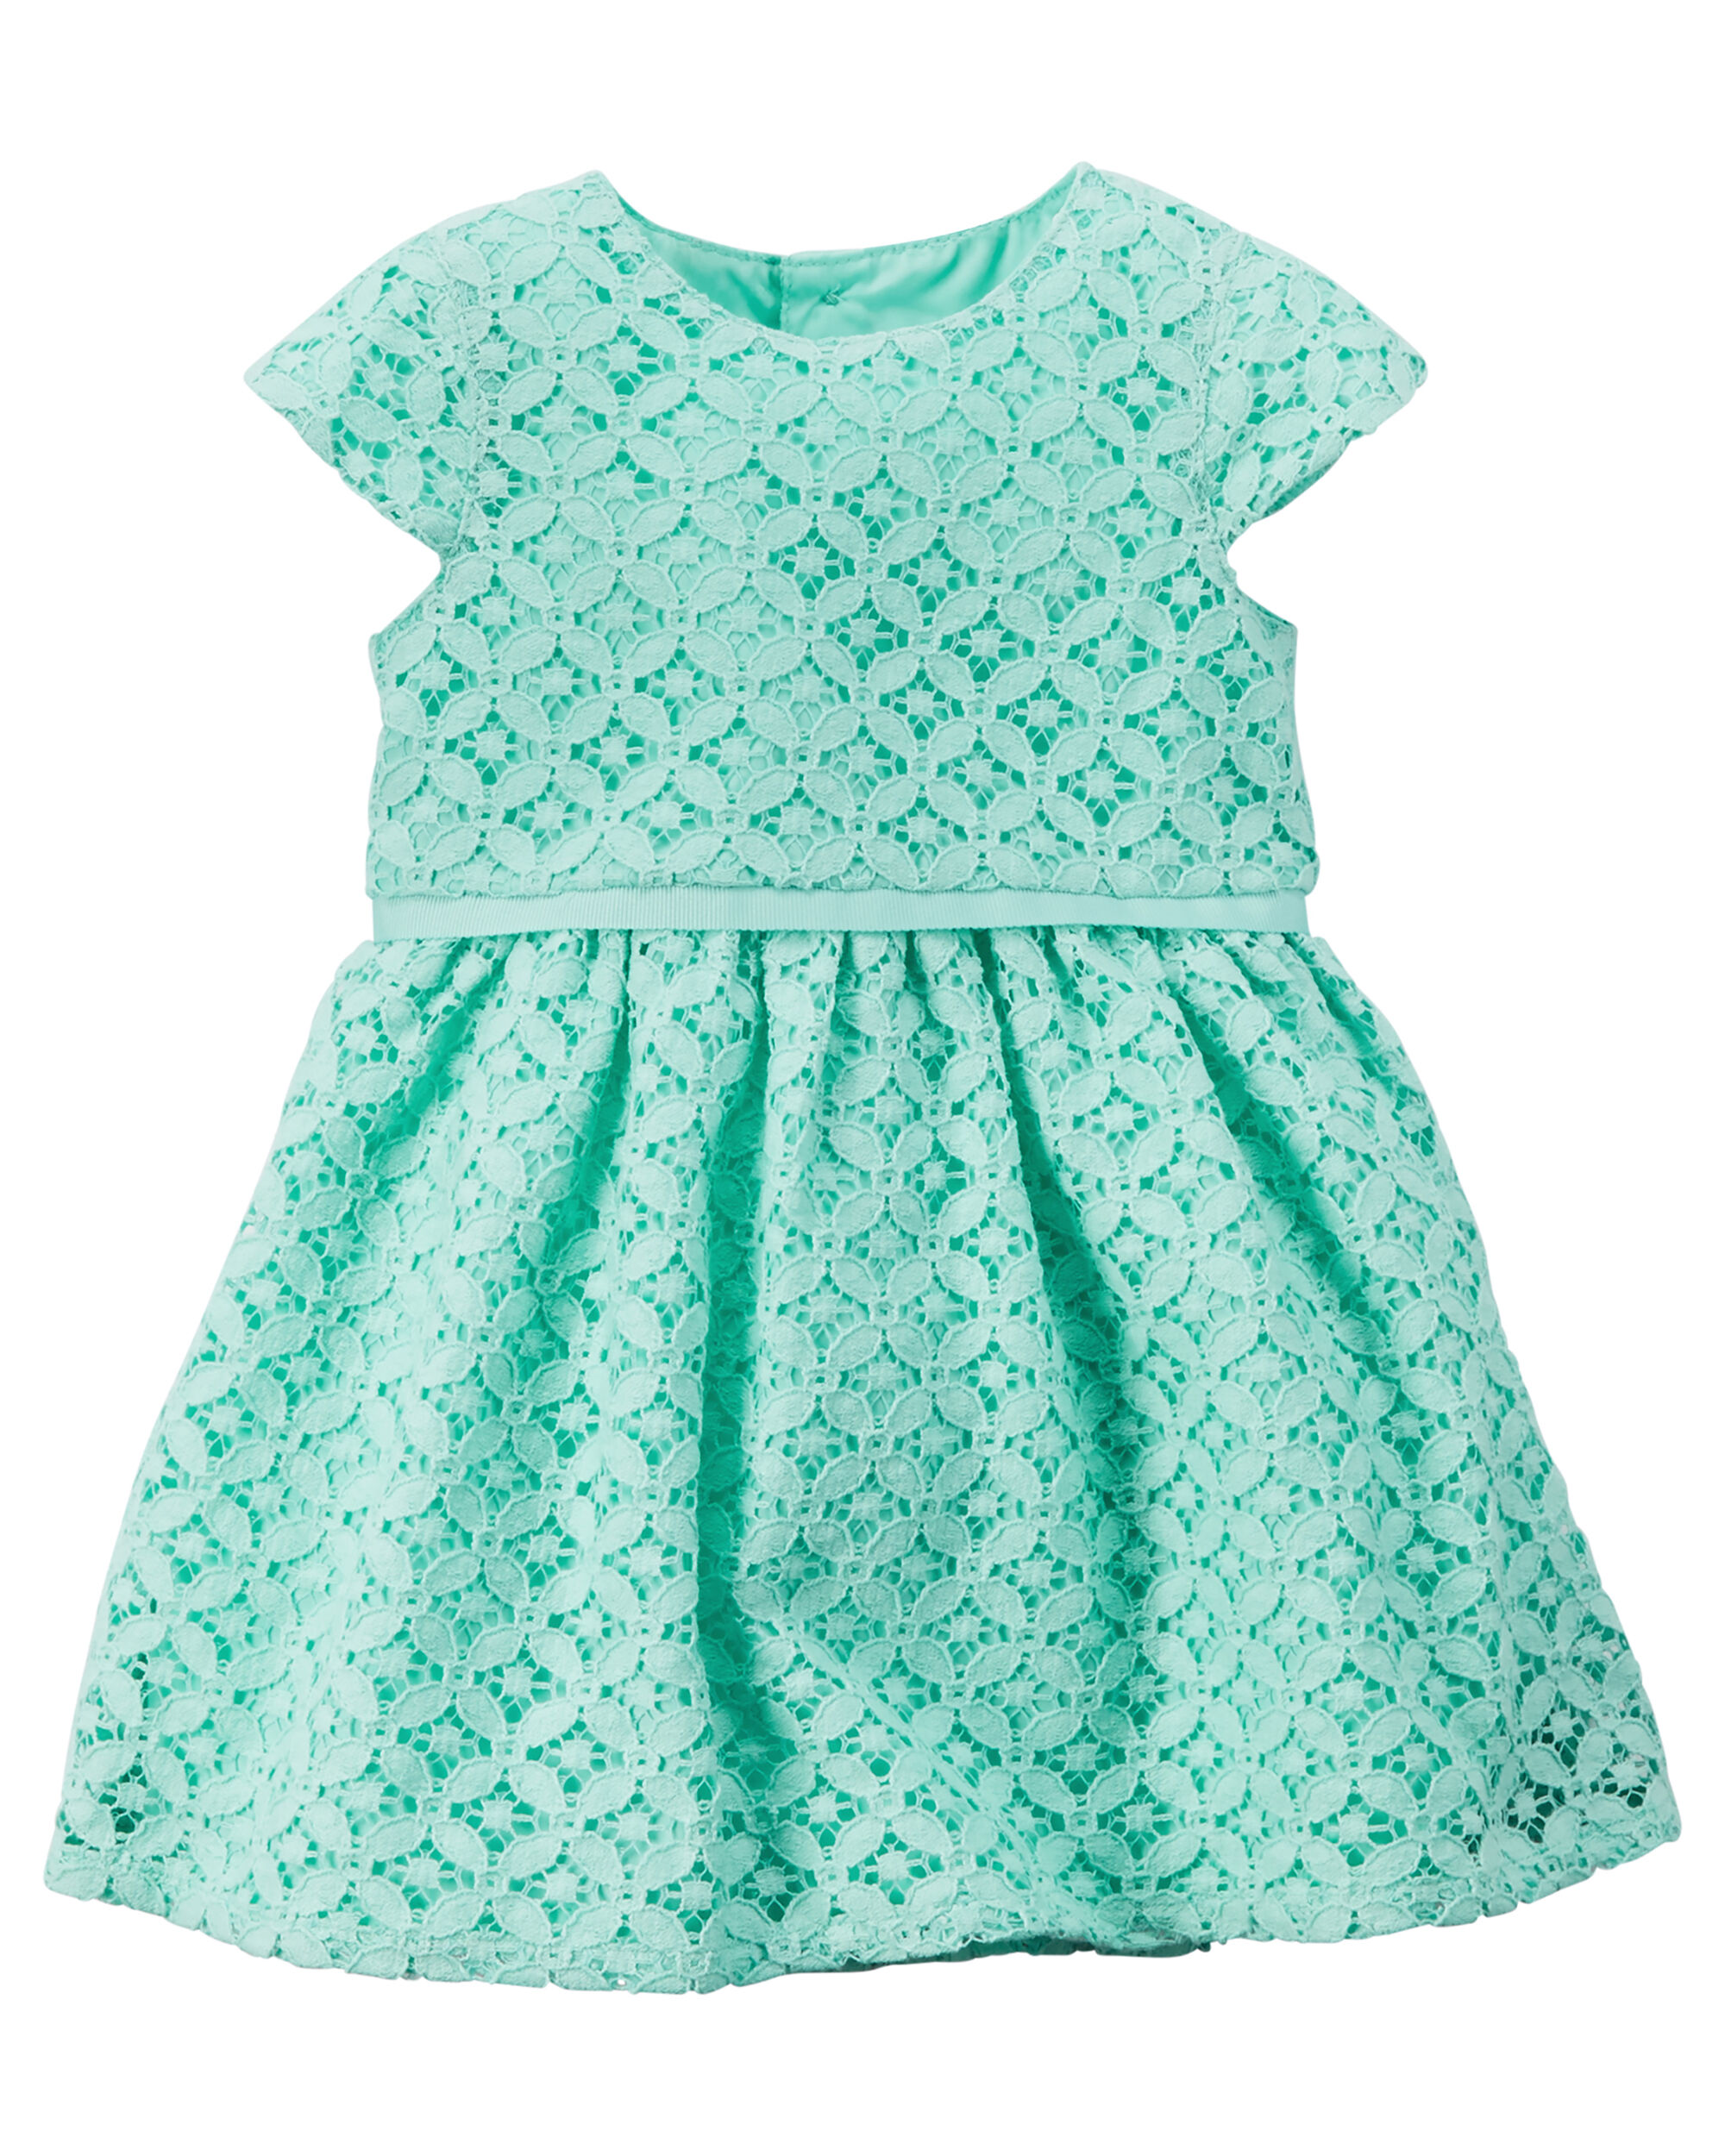 Geo Lace Dress. Loading zoom  sc 1 st  Carteru0027s & Geo Lace Dress | Carters.com